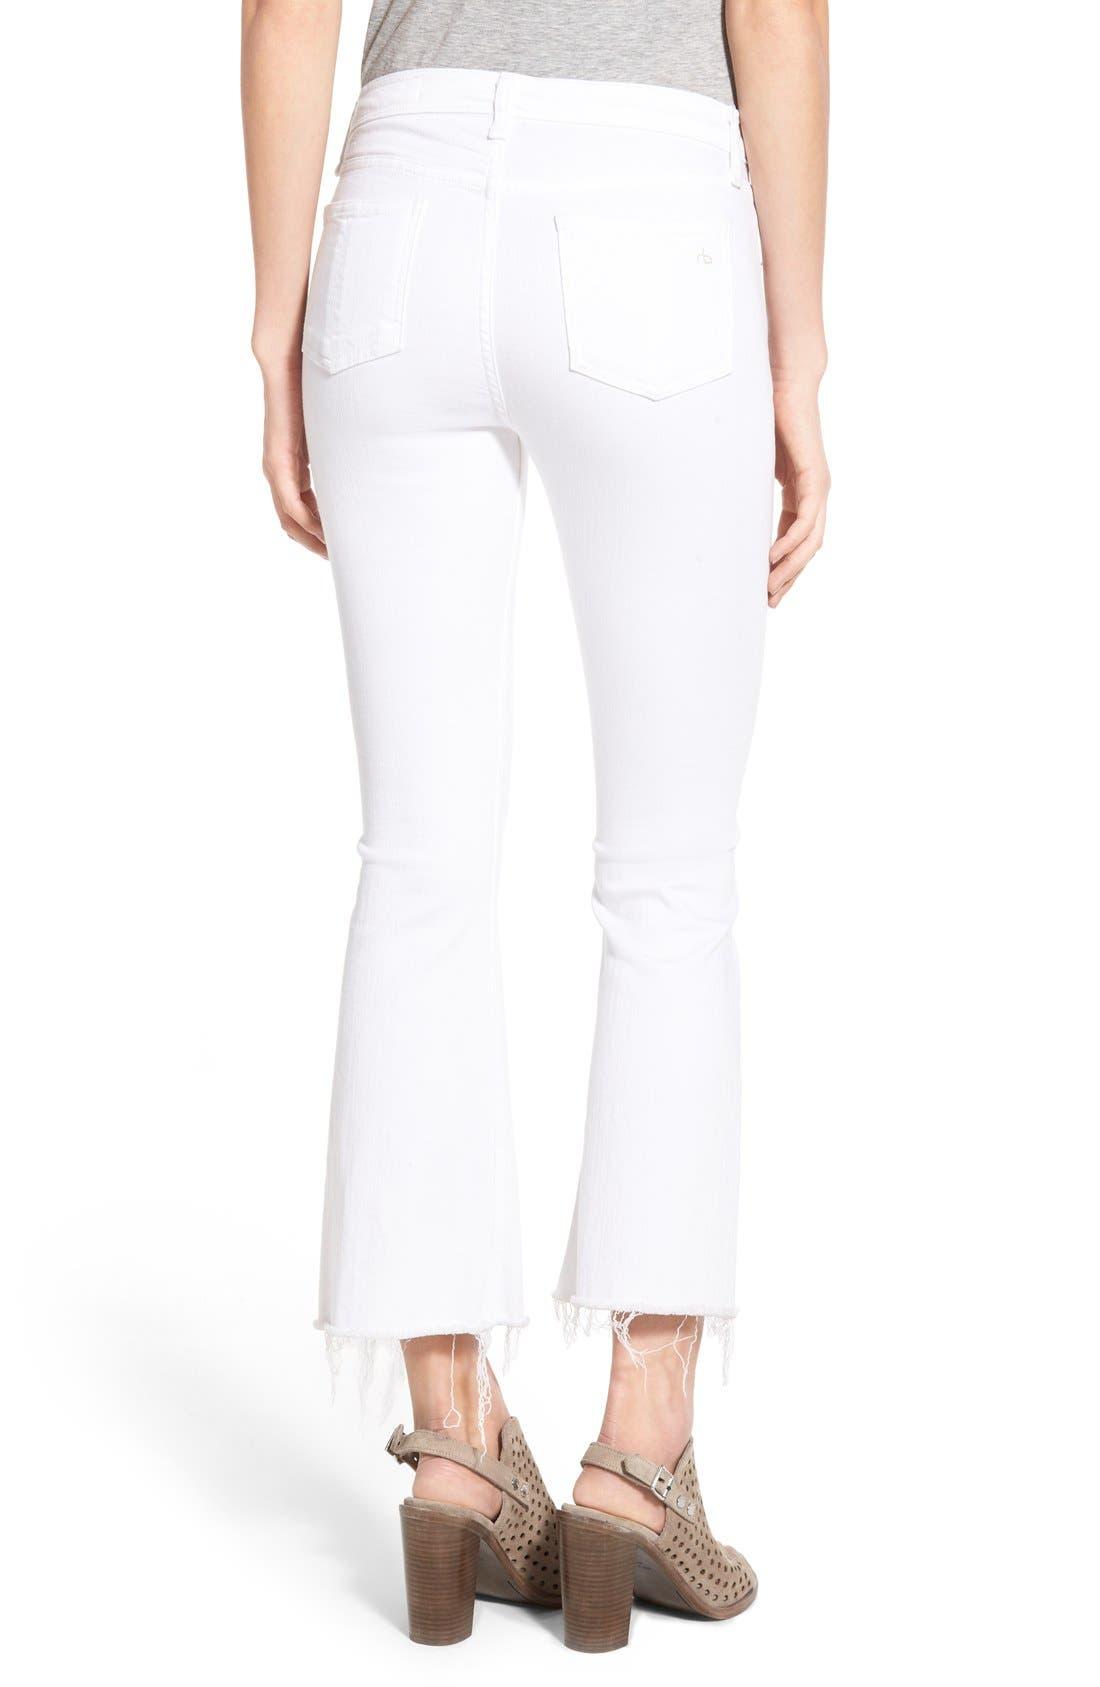 RAG & BONE, High Rise Raw Hem Crop Flare Jeans, Alternate thumbnail 3, color, BRIGHT WHITE